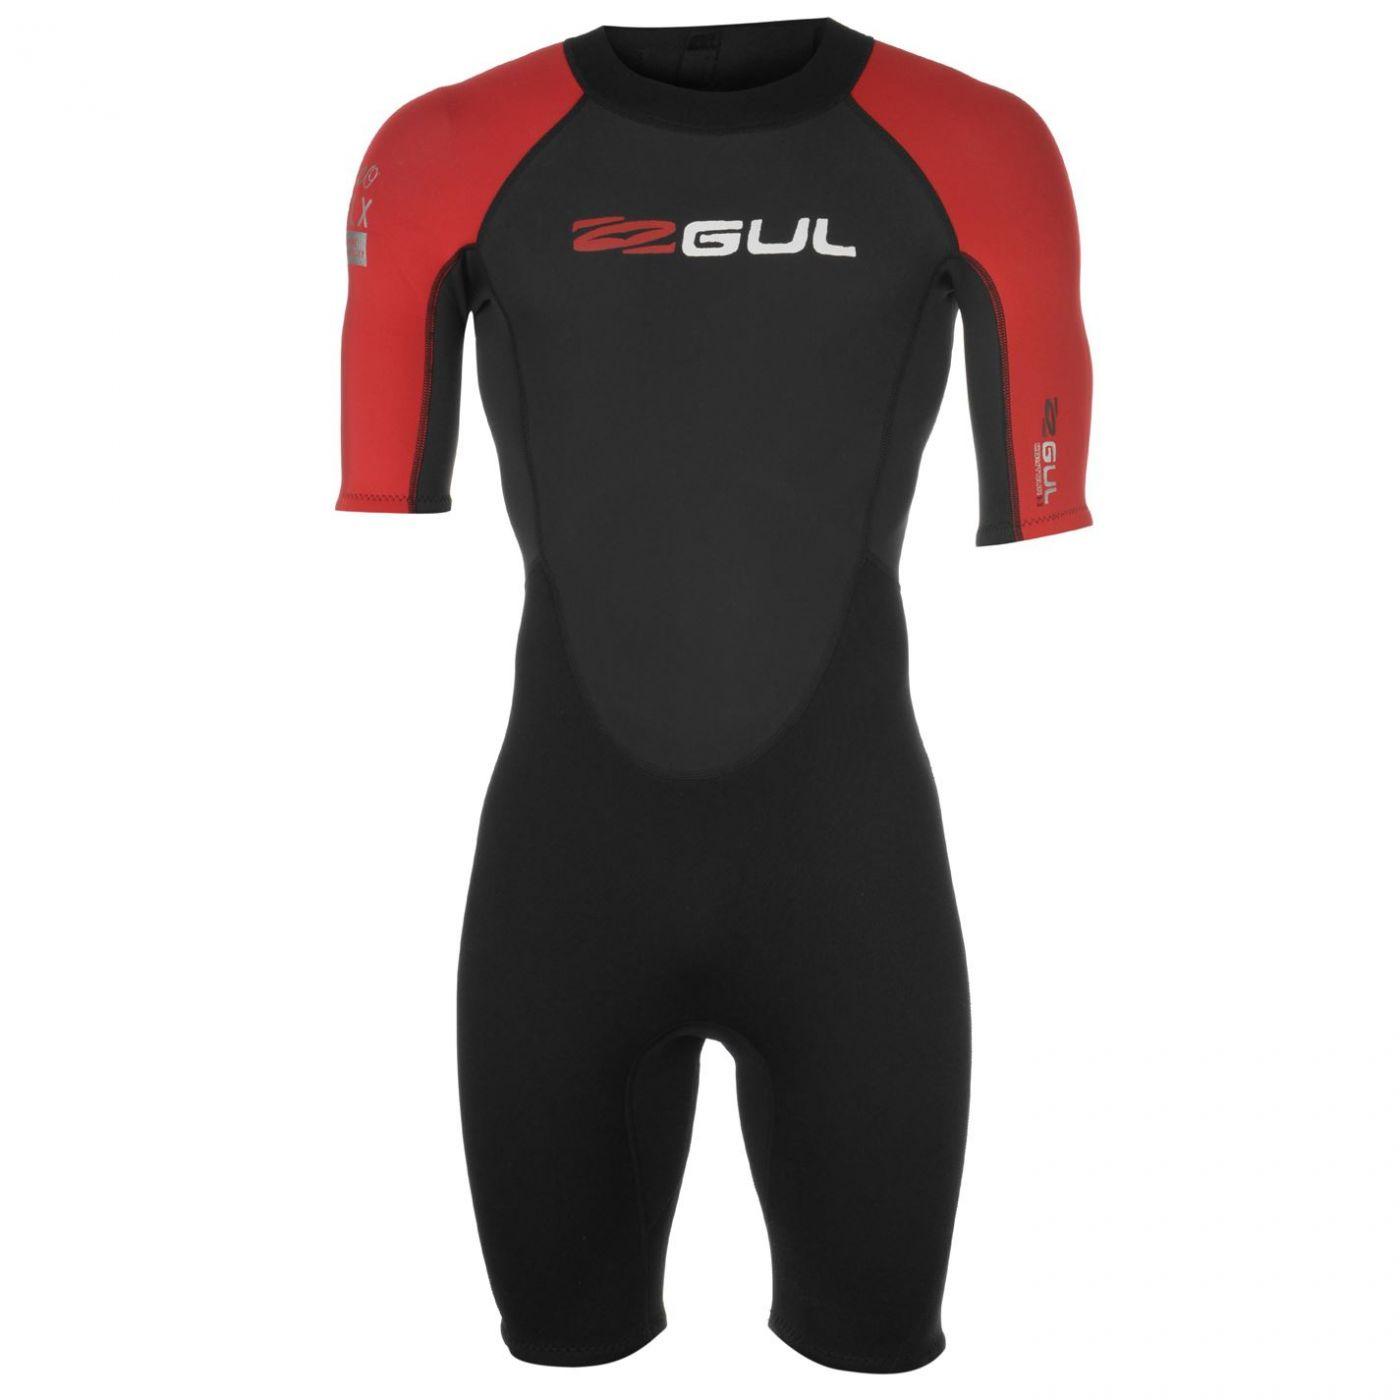 Gul Contour Wetsuit Mens Shorties